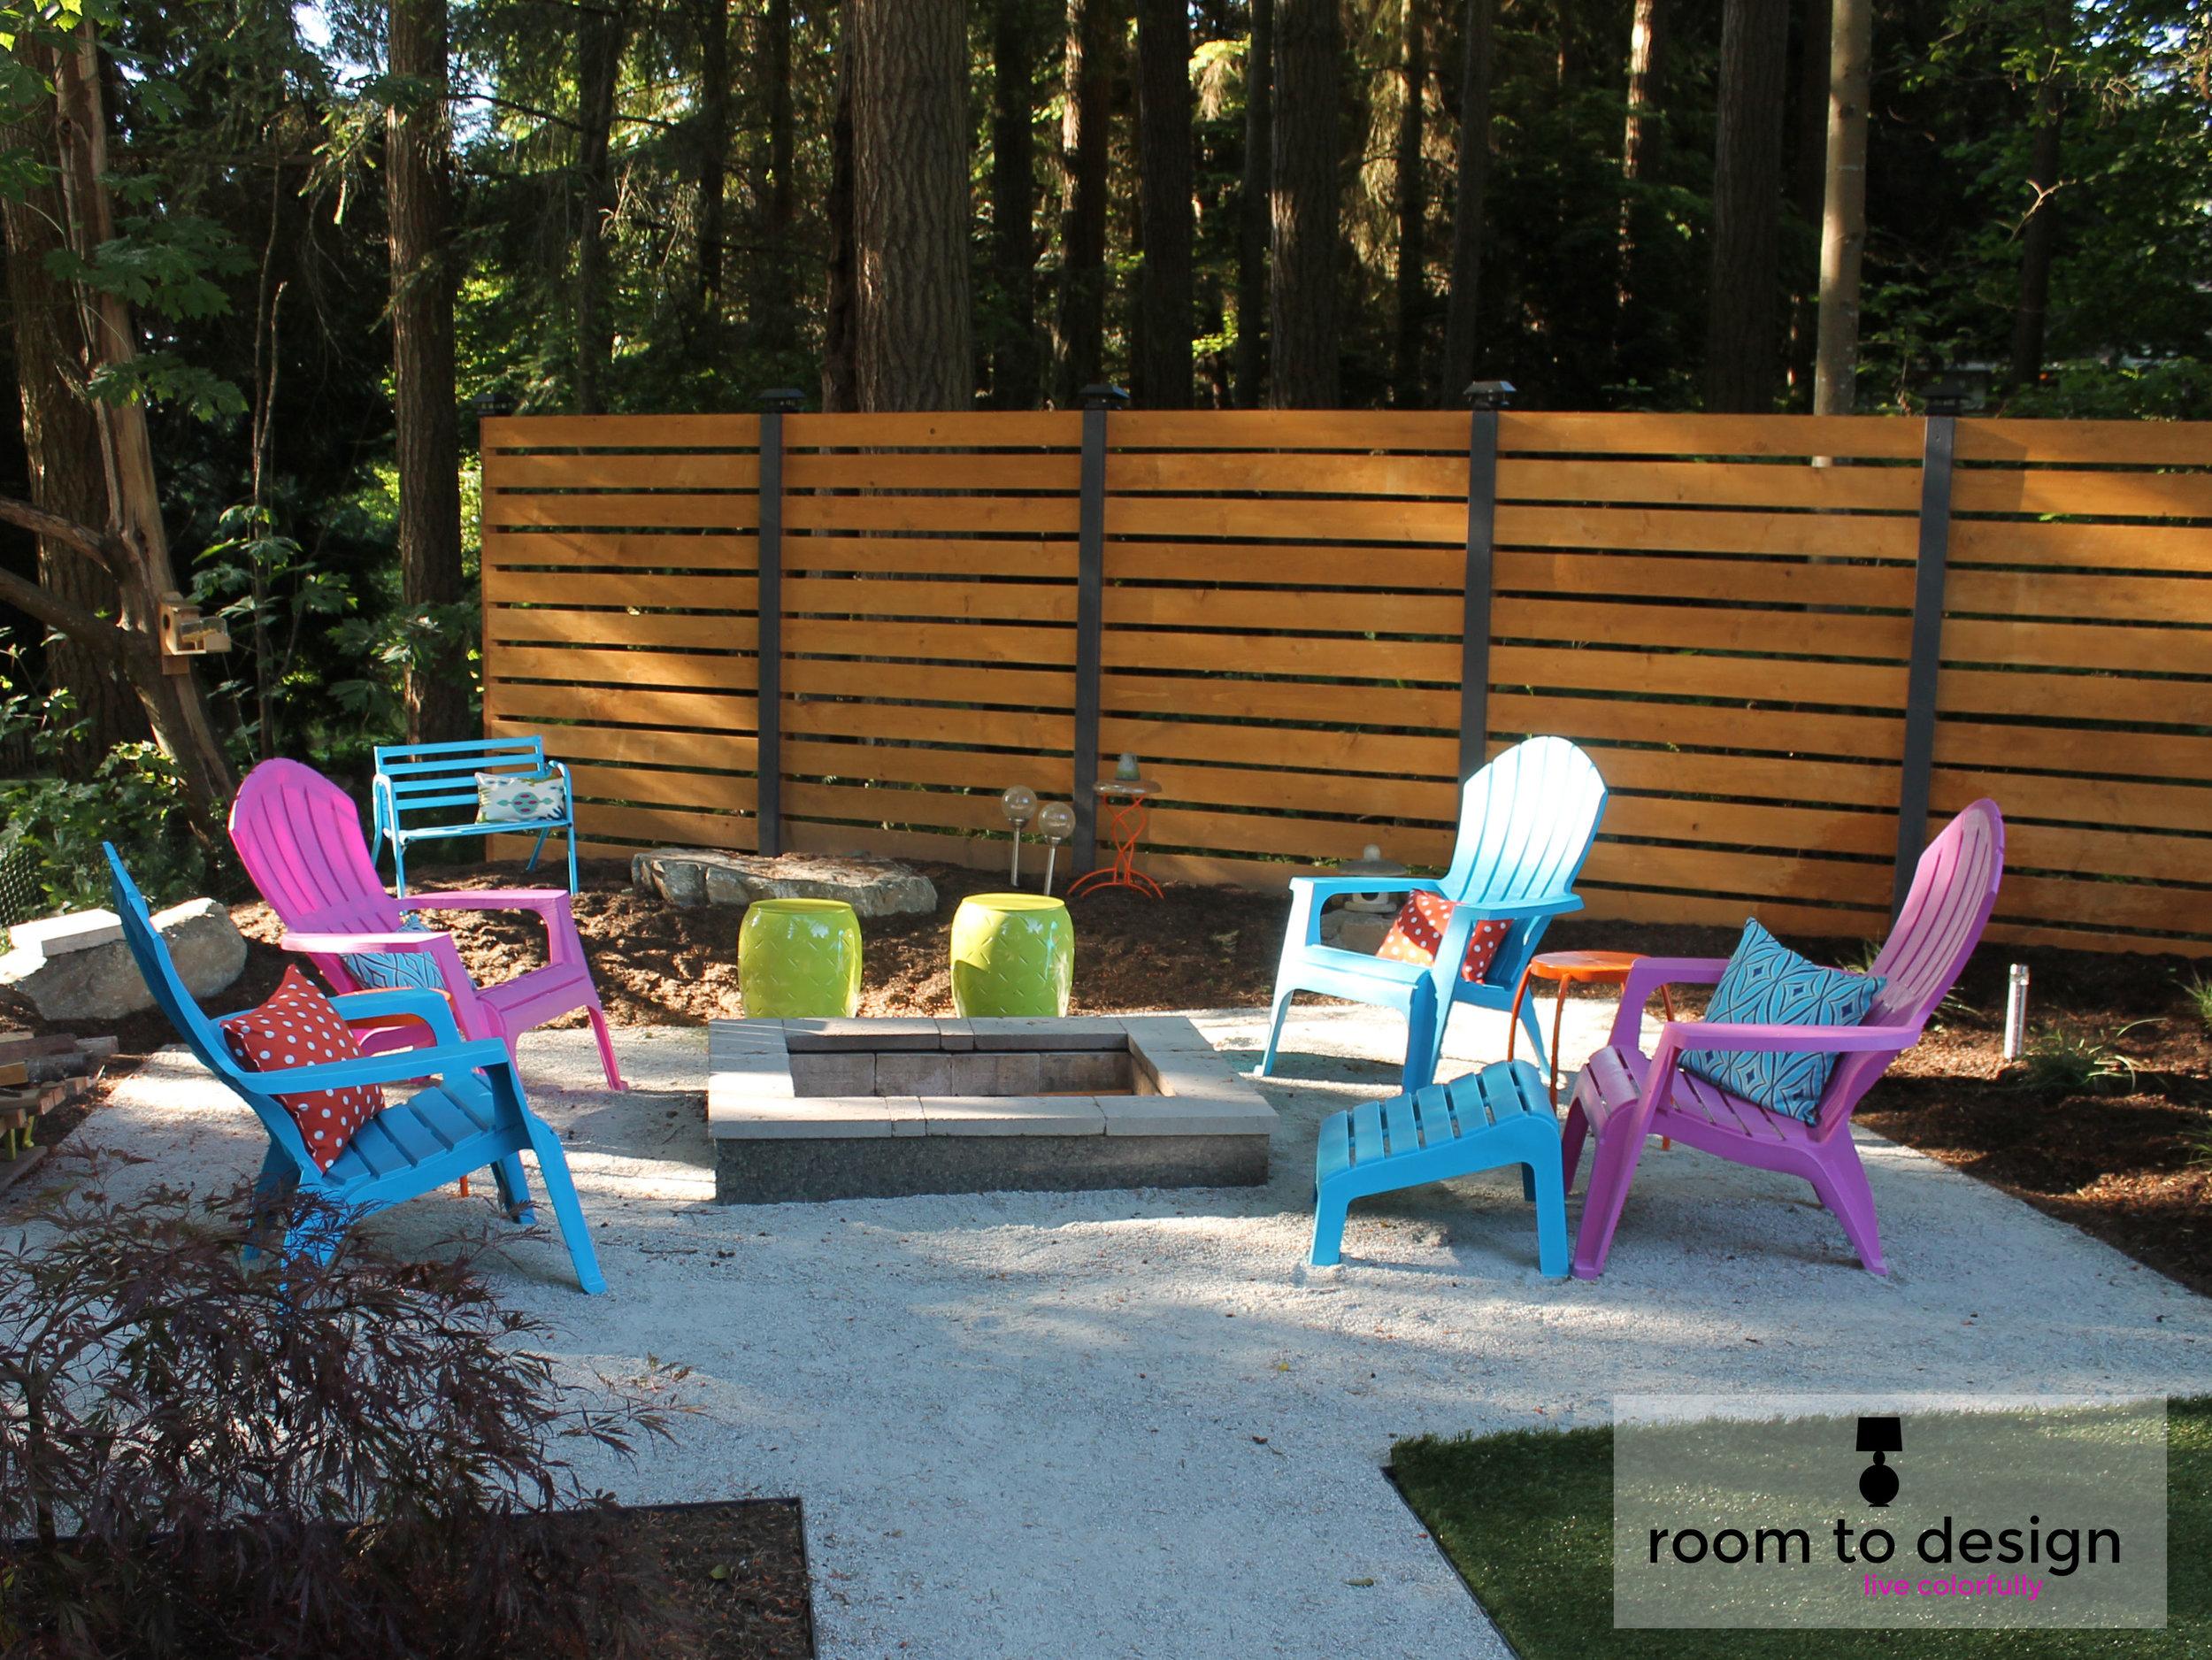 Woodinville-yard-ideas.jpg